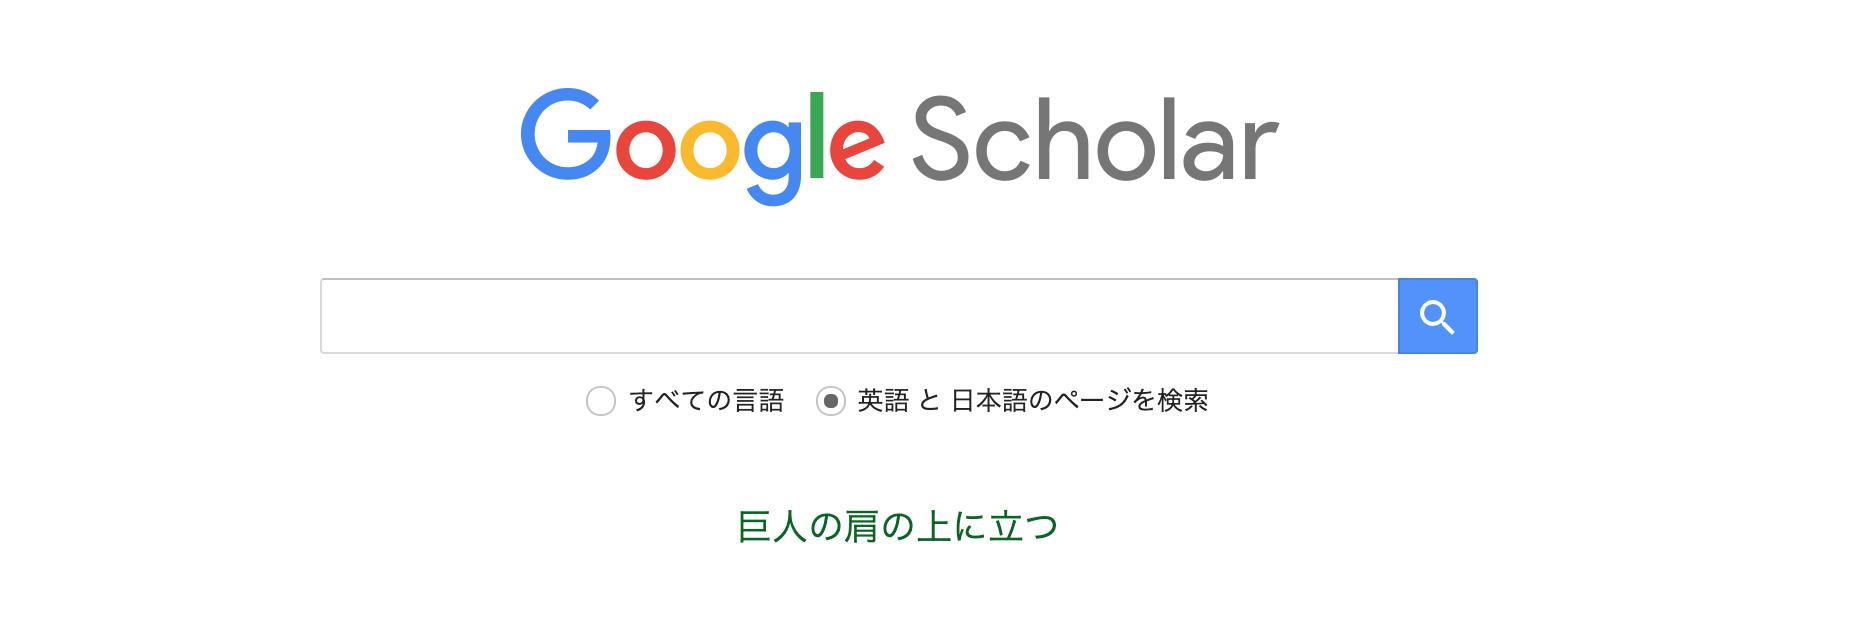 google scholarとは?使い方・アラート・citations・metricsを紹介!